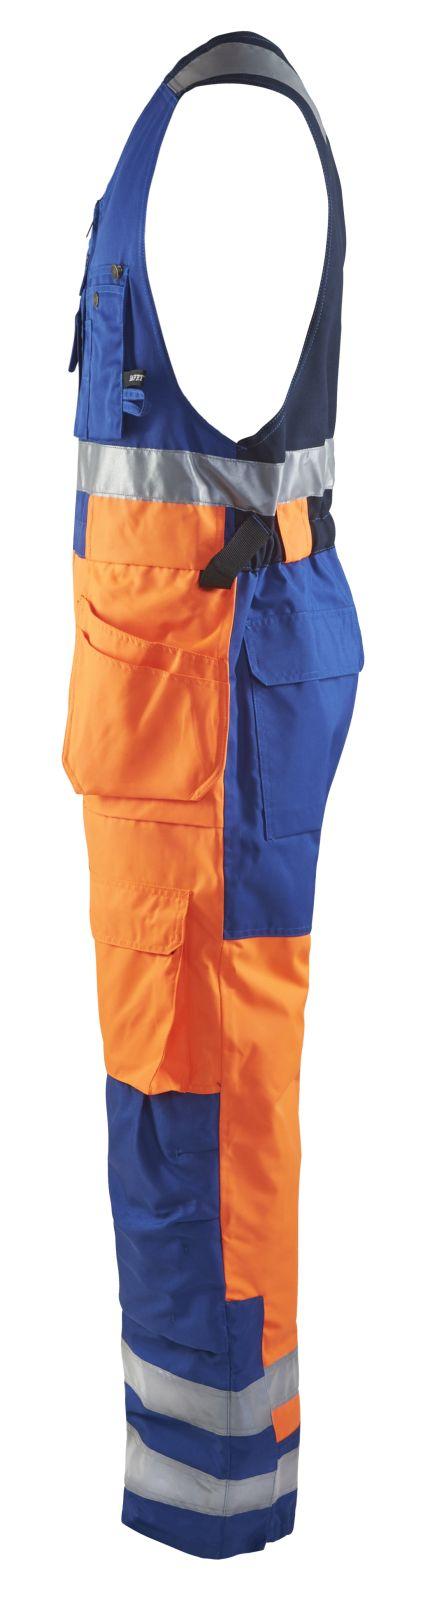 Blaklader Bodybroeken 85041977 High Vis oranje-korenblauw(5385)